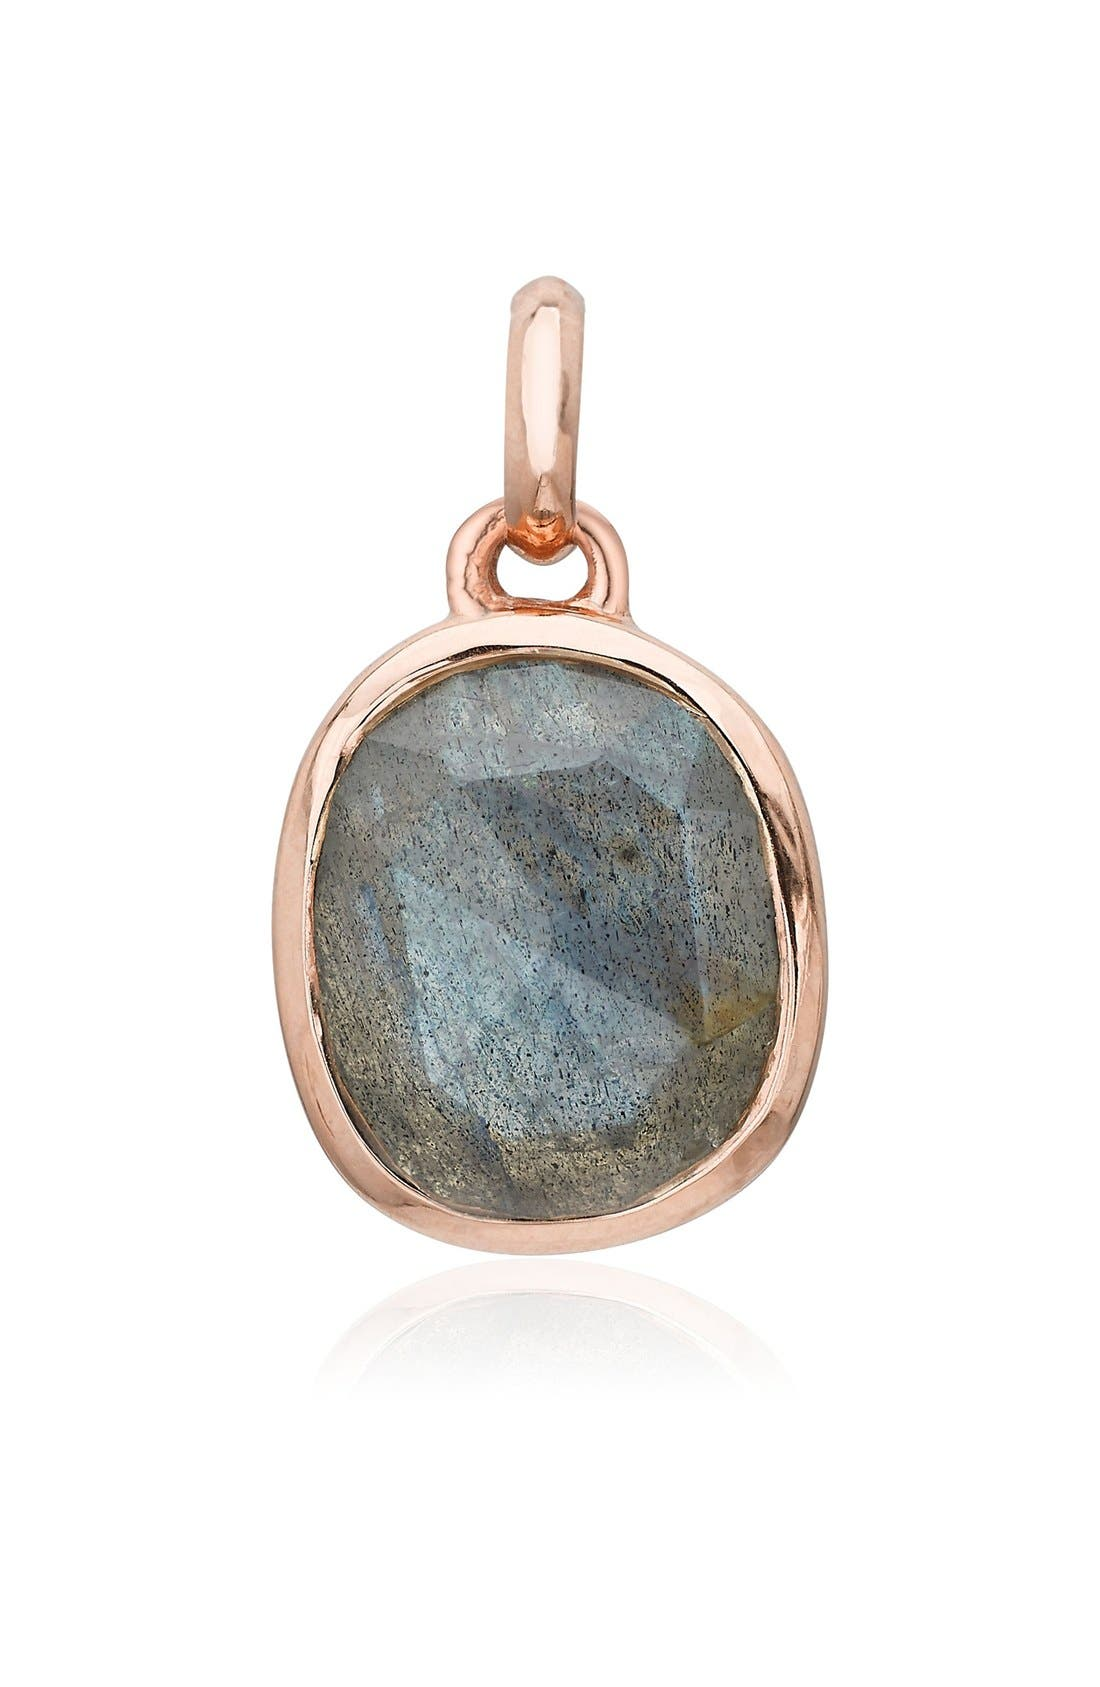 MONICA VINADER Siren Semiprecious Stone Pendant